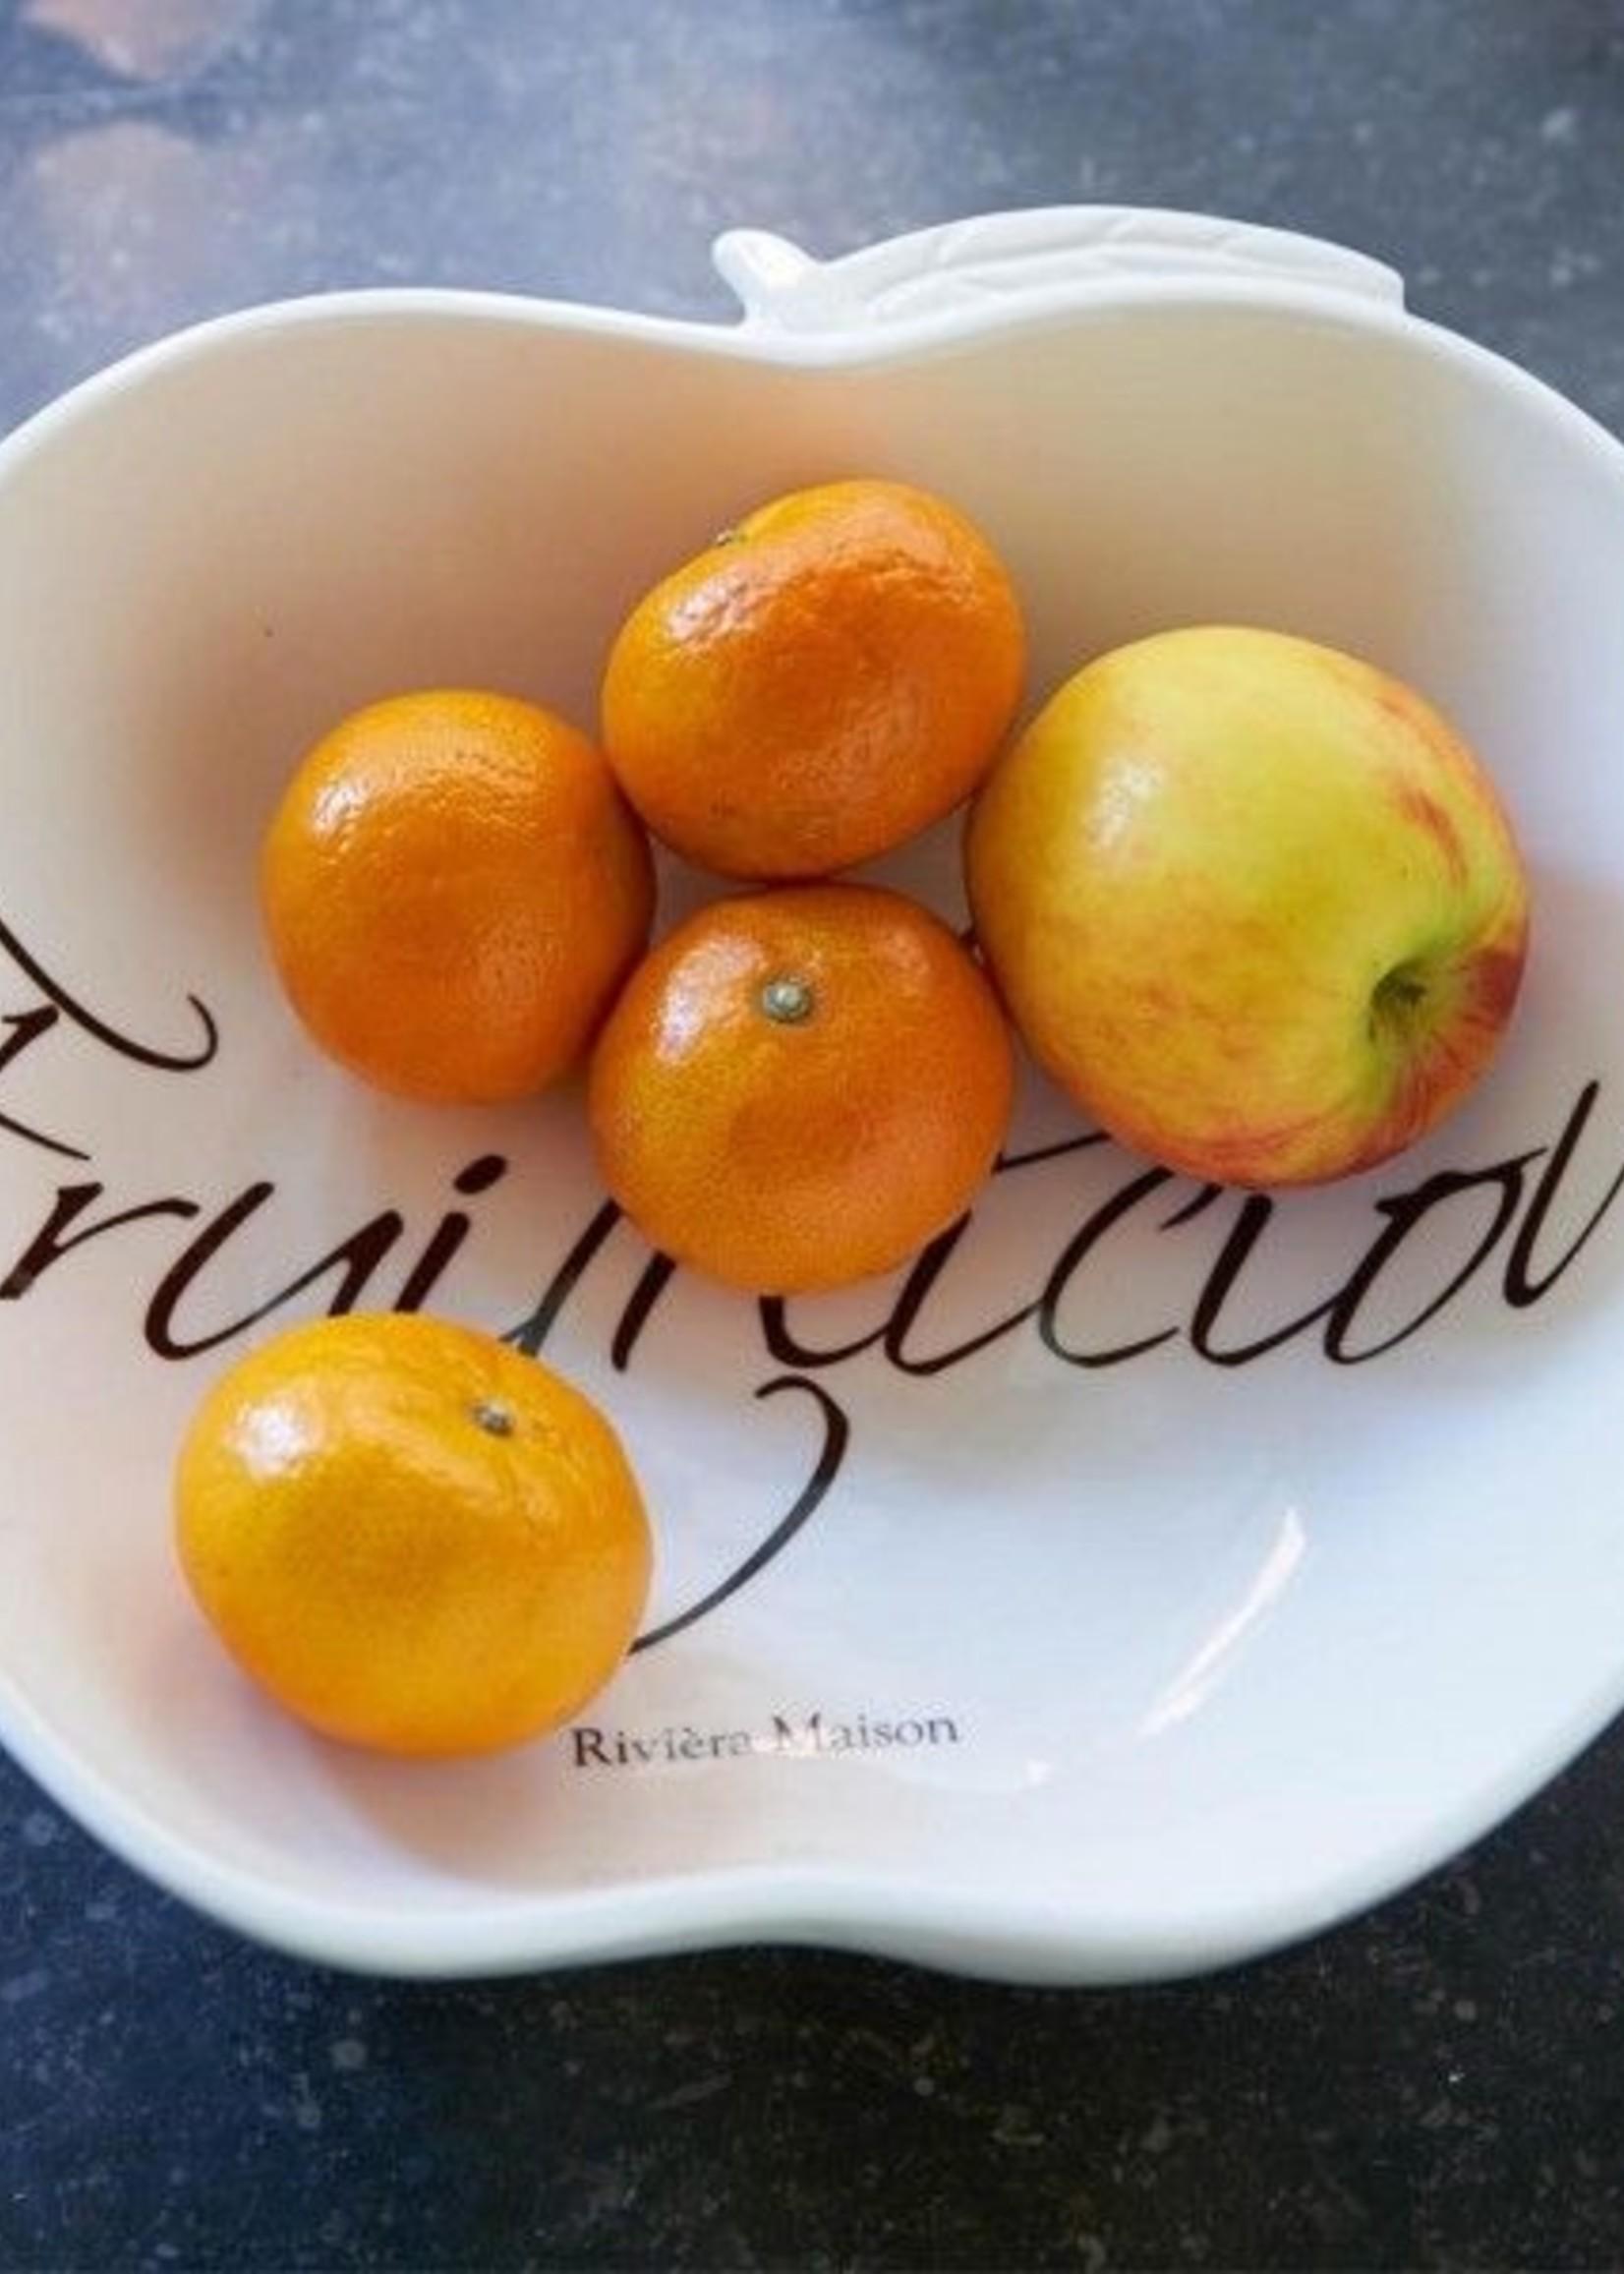 Riviera Maison Fruitilicious Bowl